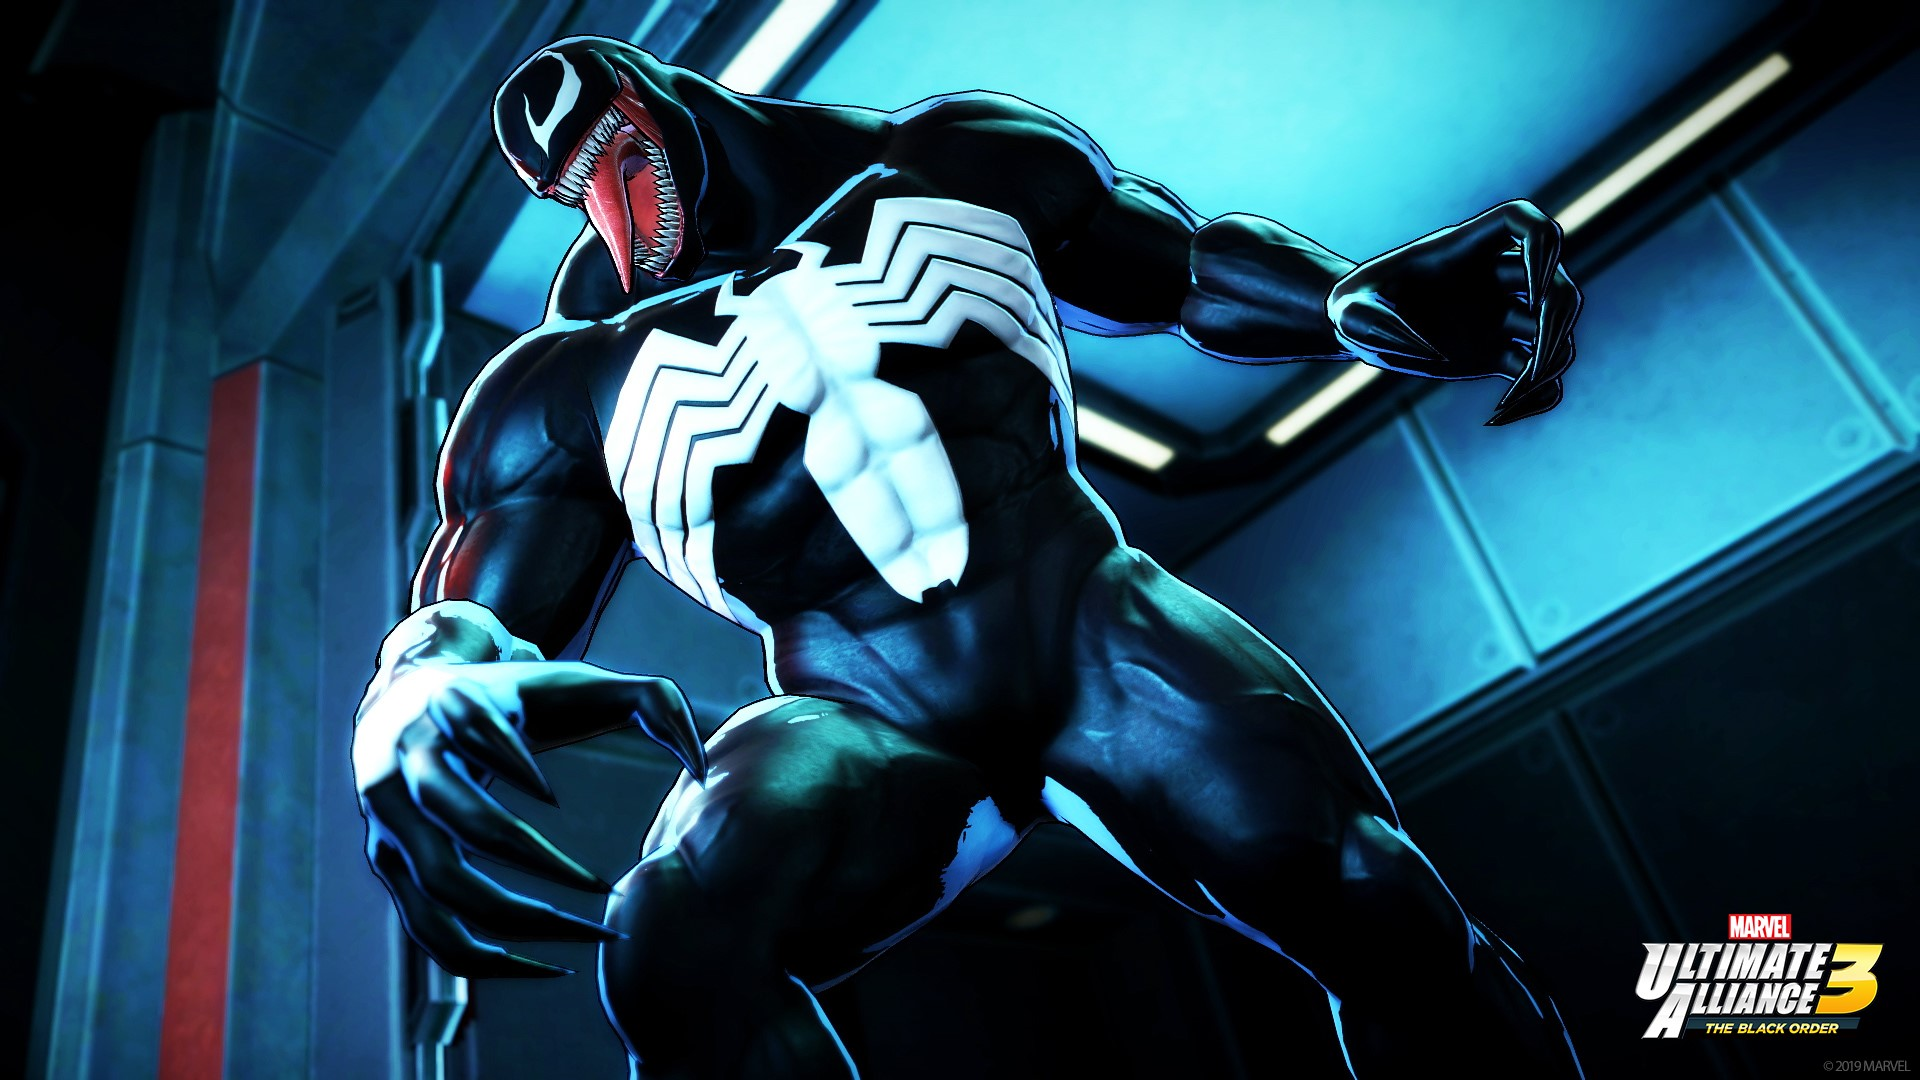 Marvel Ultimate Alliance 3 screenshots - Nintendo Everything